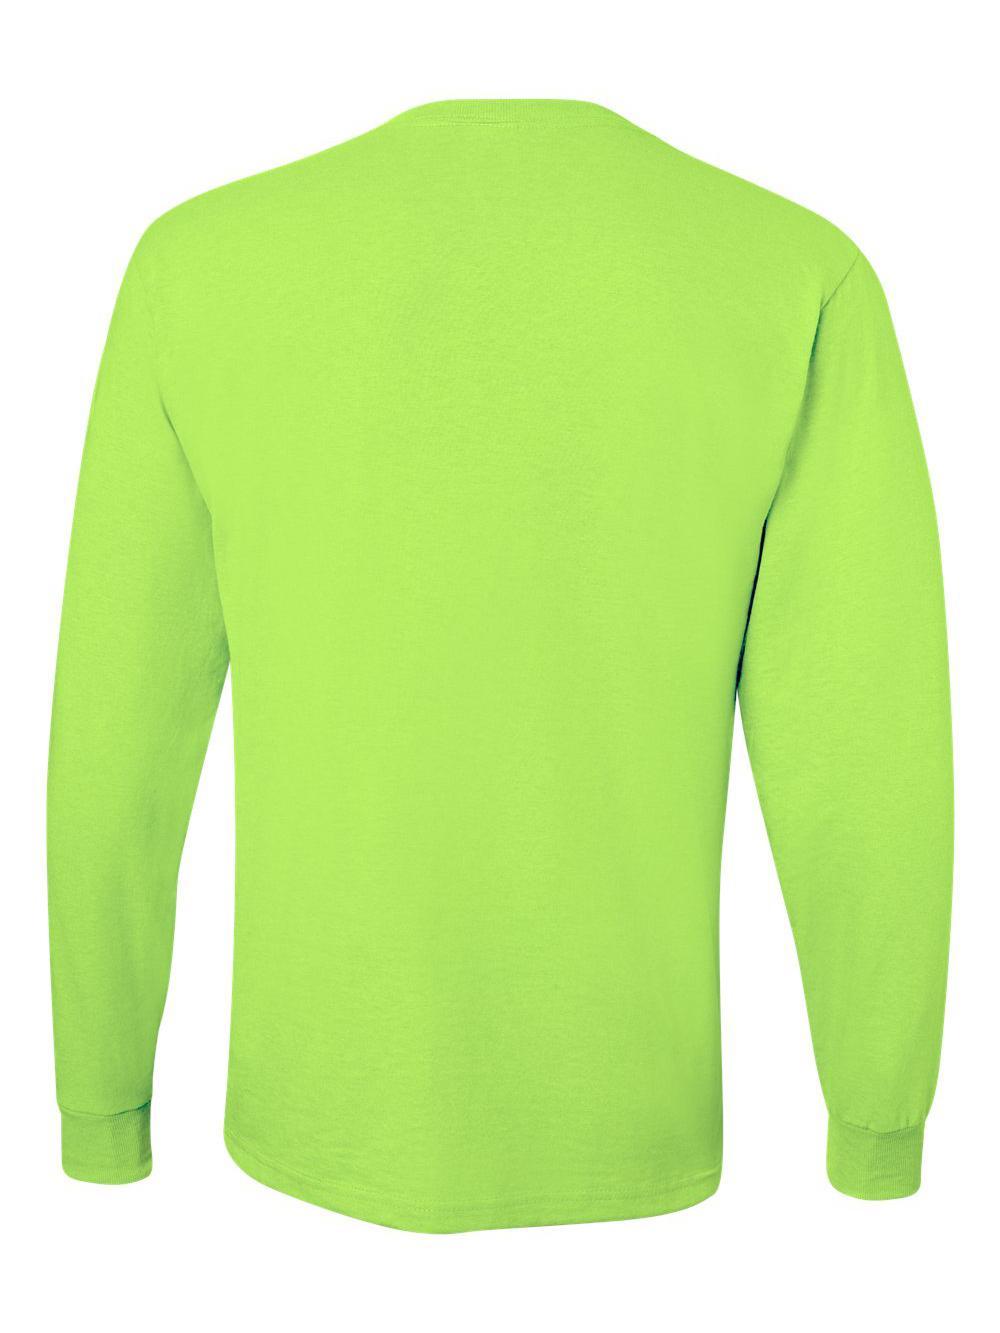 Jerzees-Dri-Power-Long-Sleeve-50-50-T-Shirt-29LSR thumbnail 73